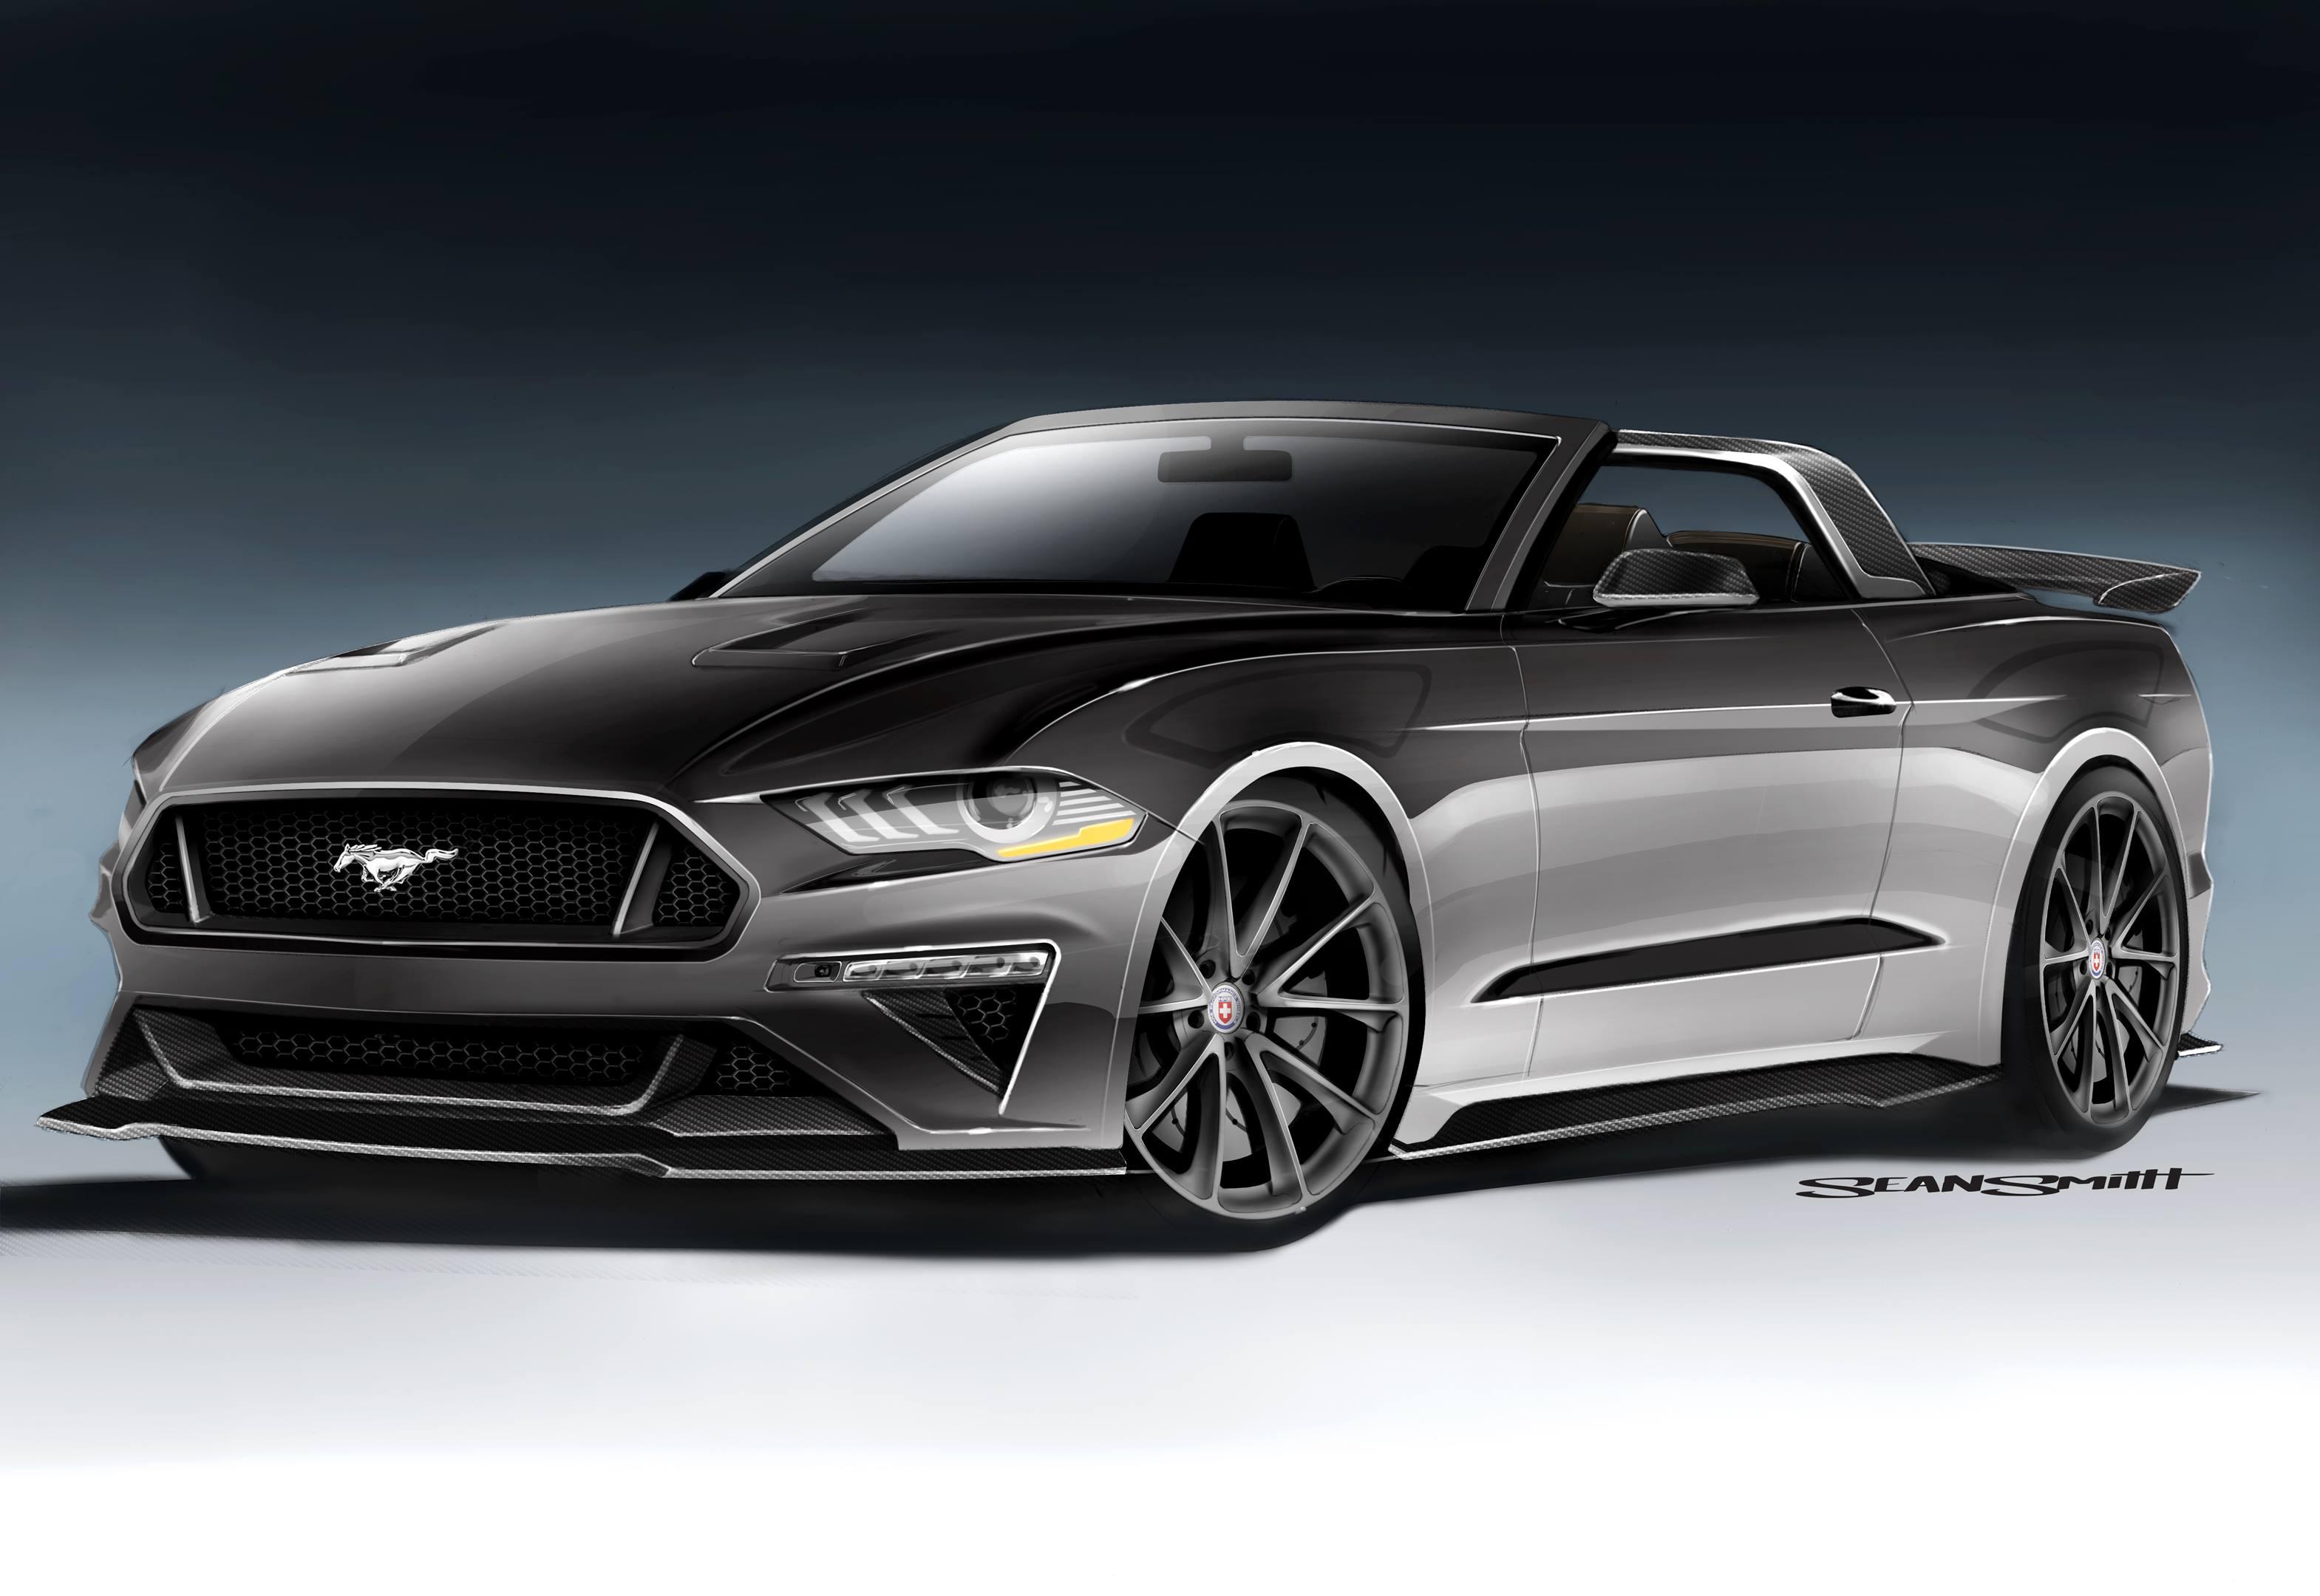 2018 Speedkore Mustang